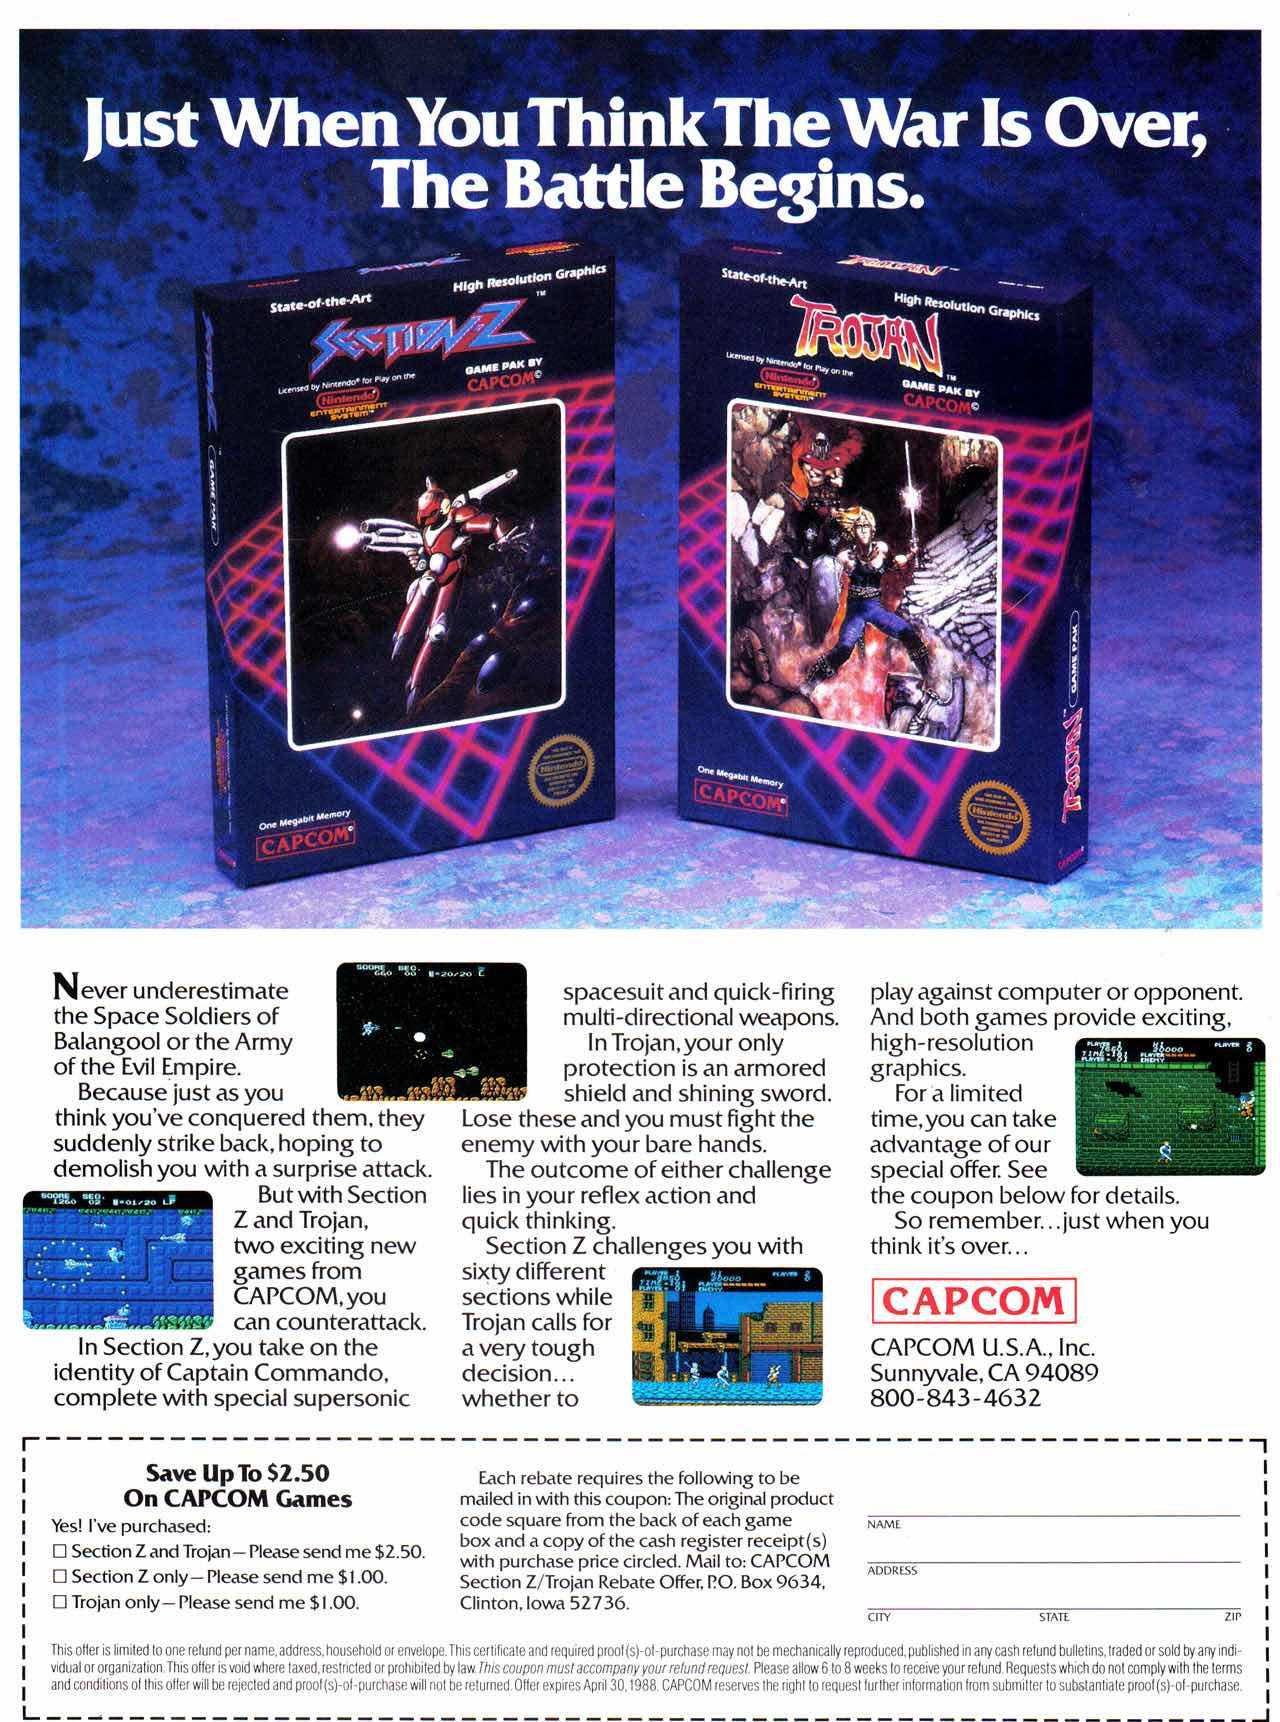 Nintendo Fun Club News | Feb-Mar 1988 Trojan Section-Z Ad